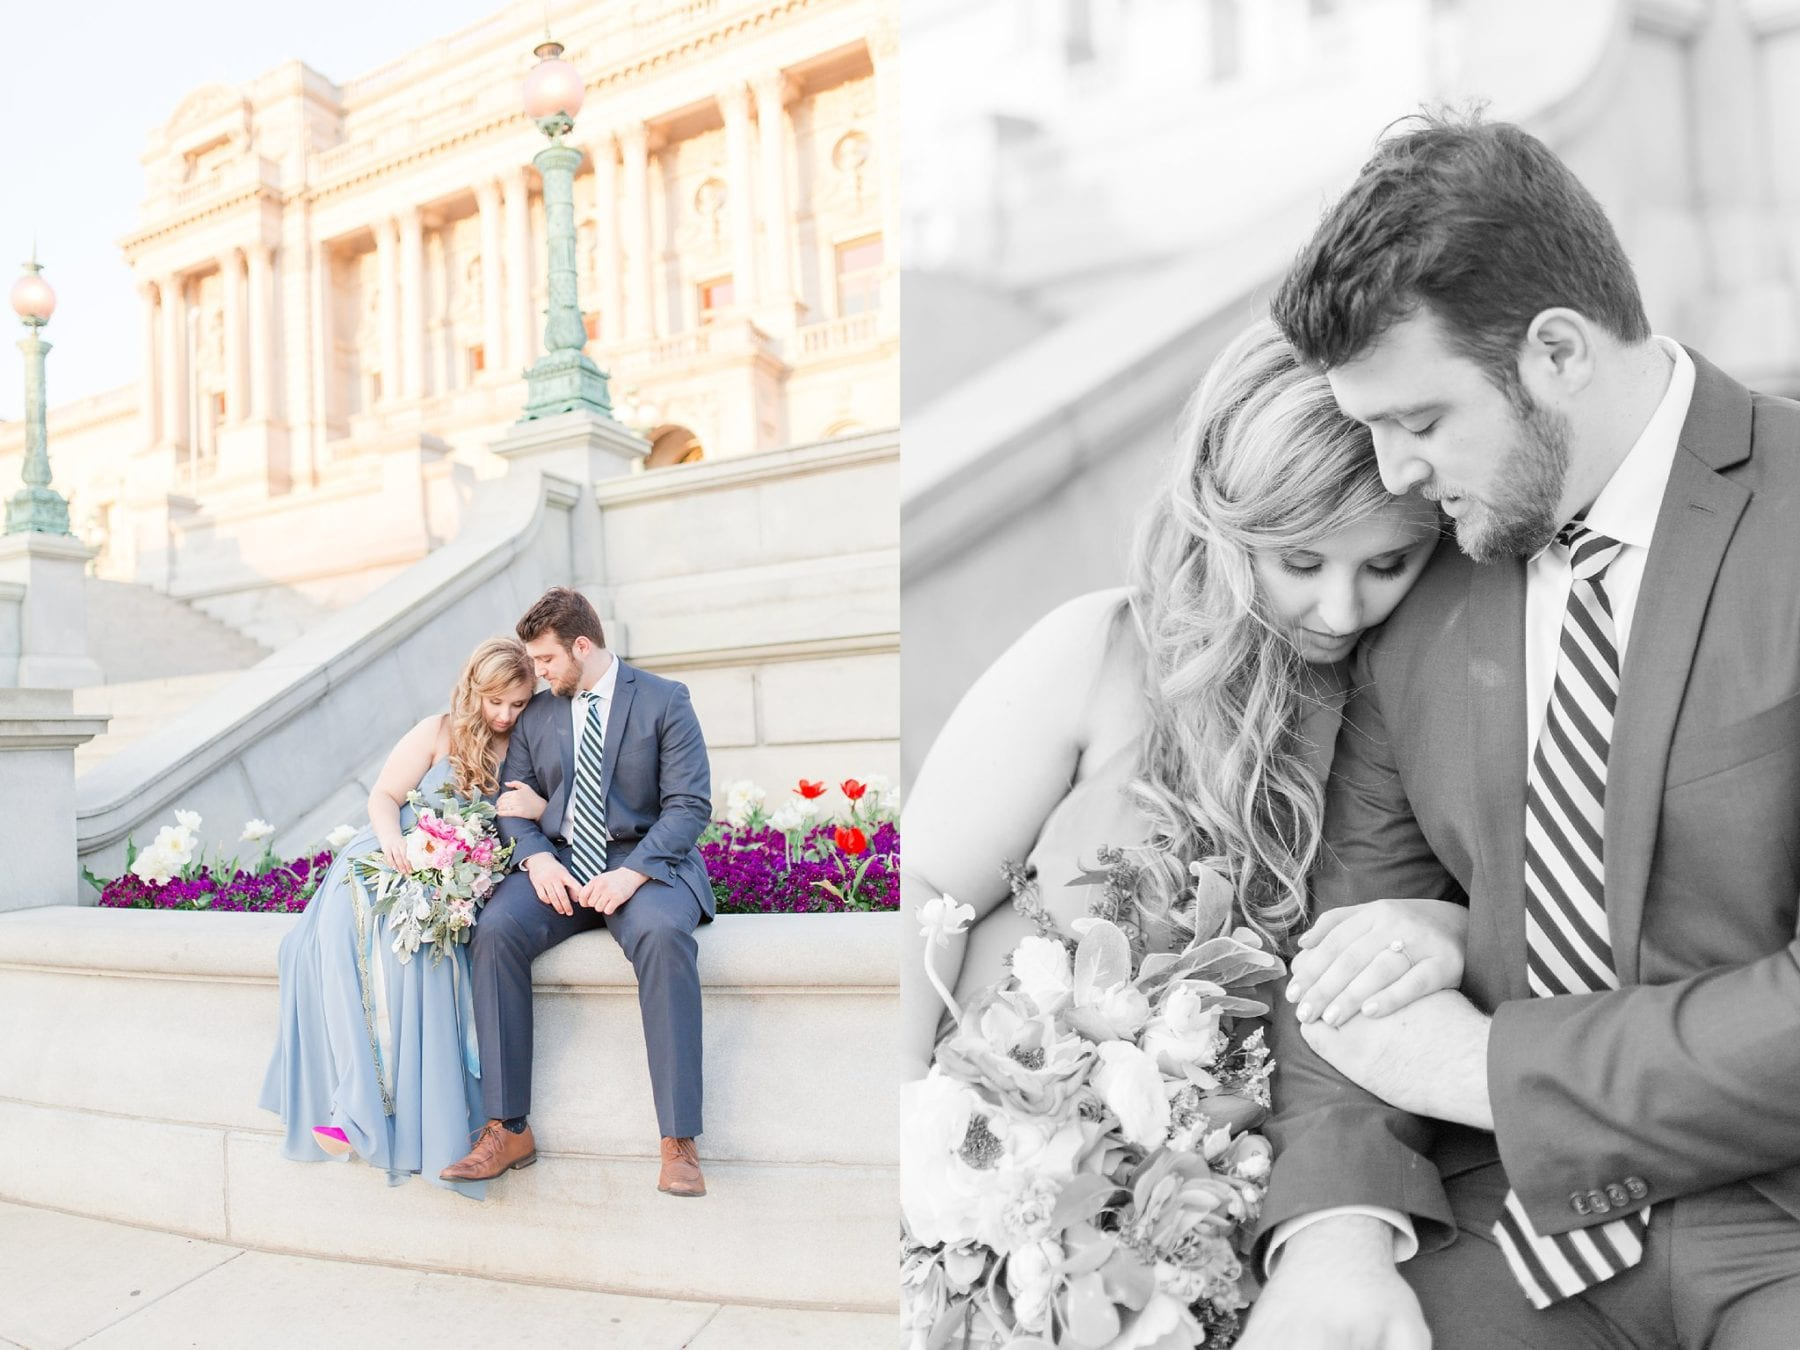 Capitol Hill Engagement Photos Kelly & Zach Washington DC Wedding Photographer Megan Kelsey Photography-268.jpg